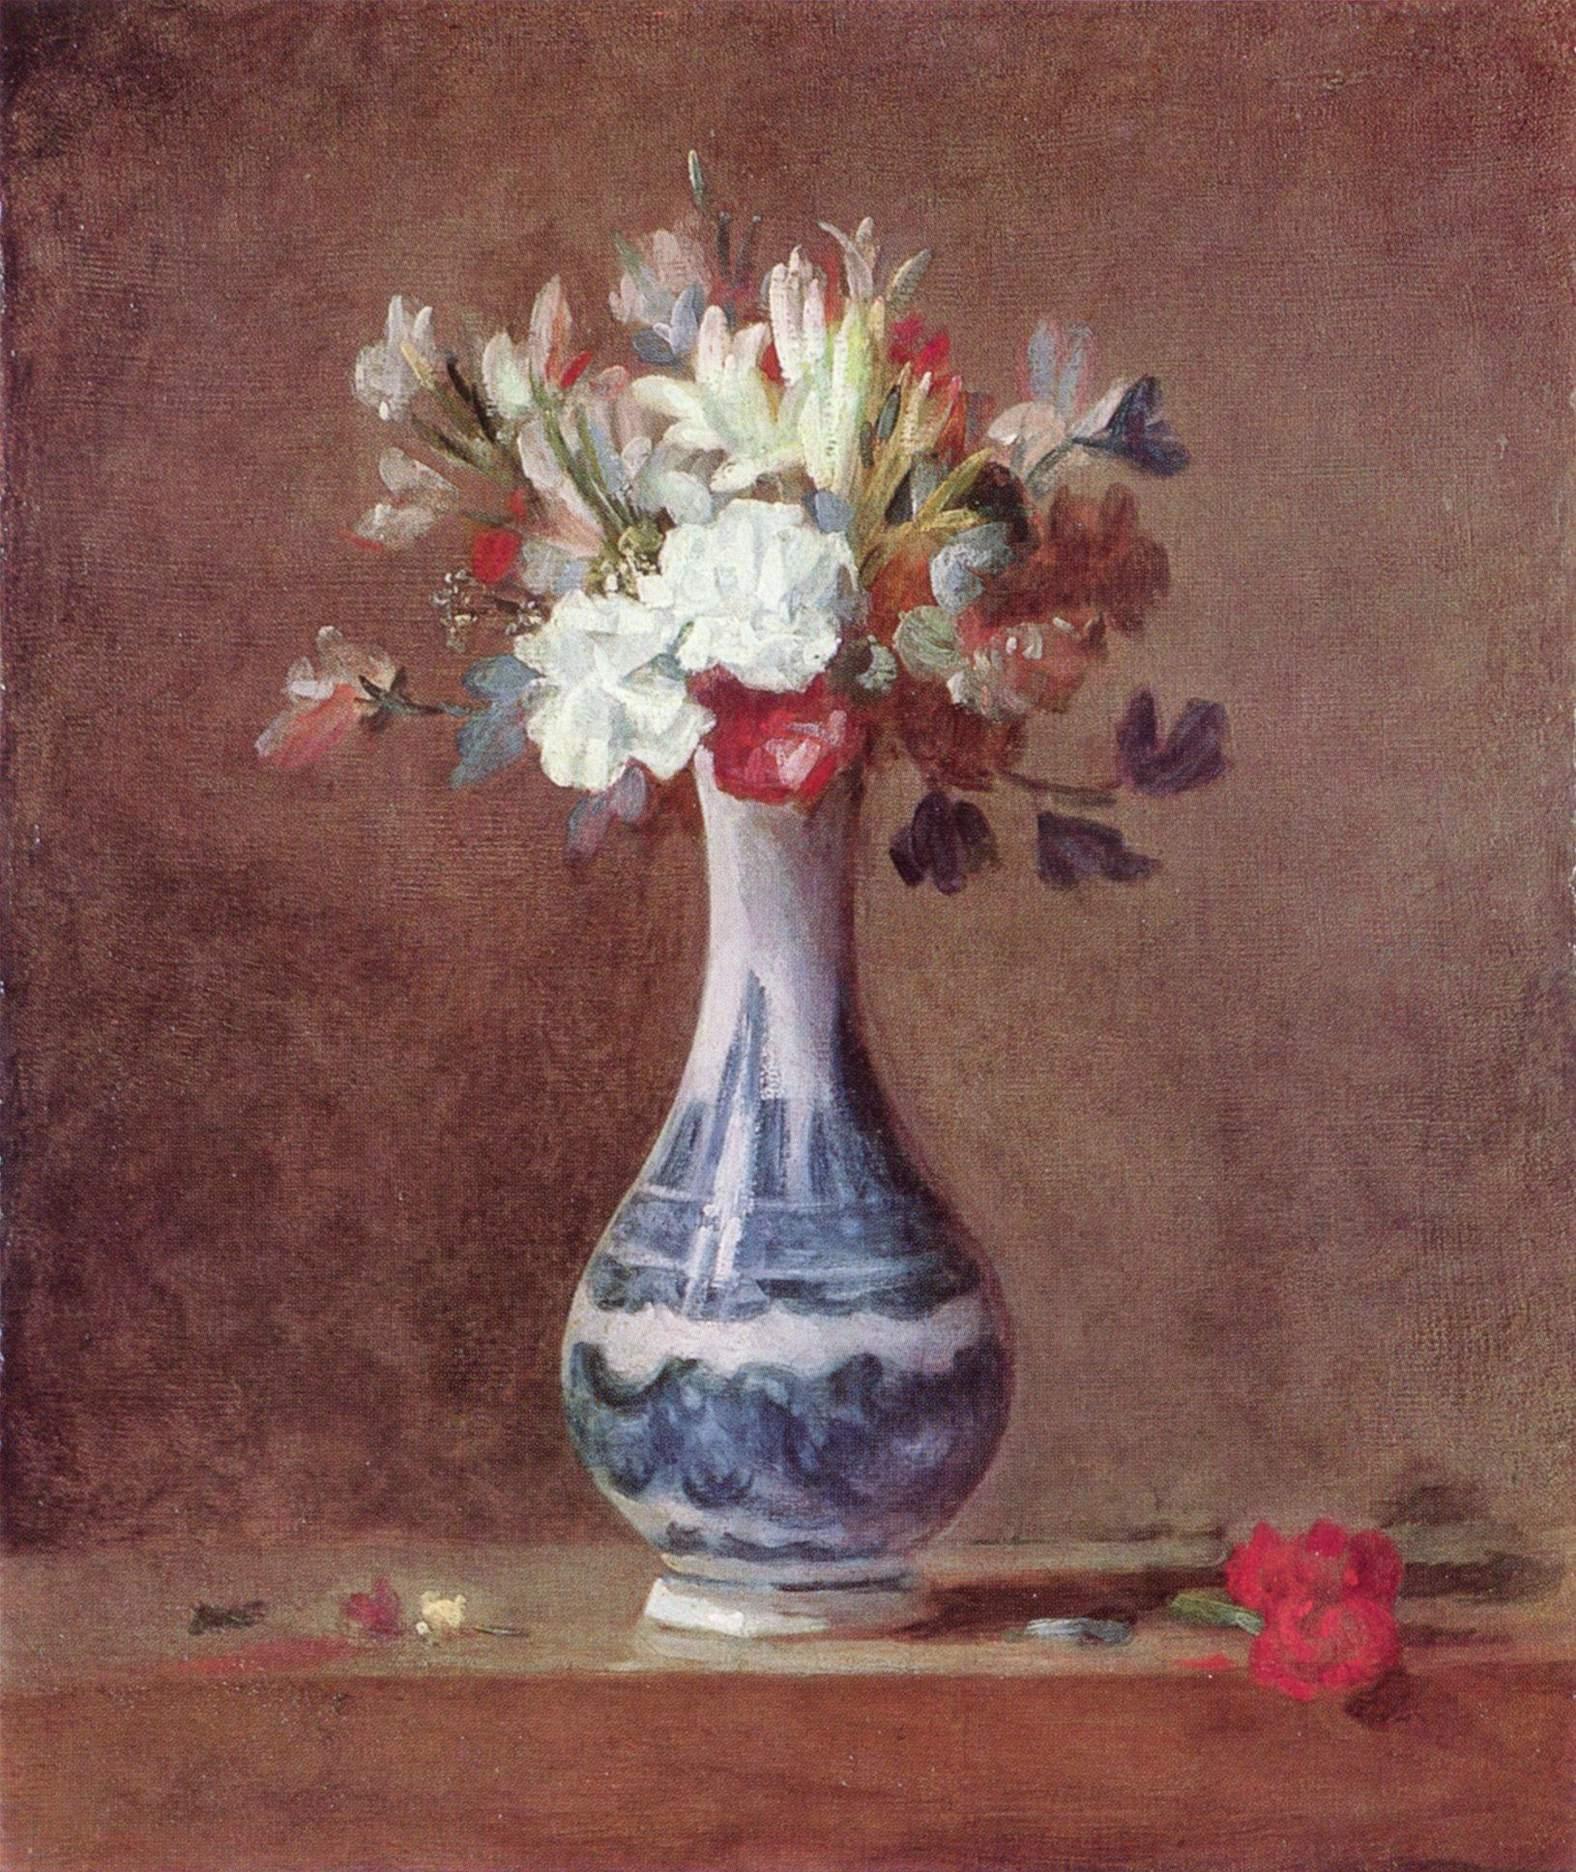 Still life flowers in a vase c1760 1763 jean baptiste still life flowers in a vase c1760 1763 jean reviewsmspy